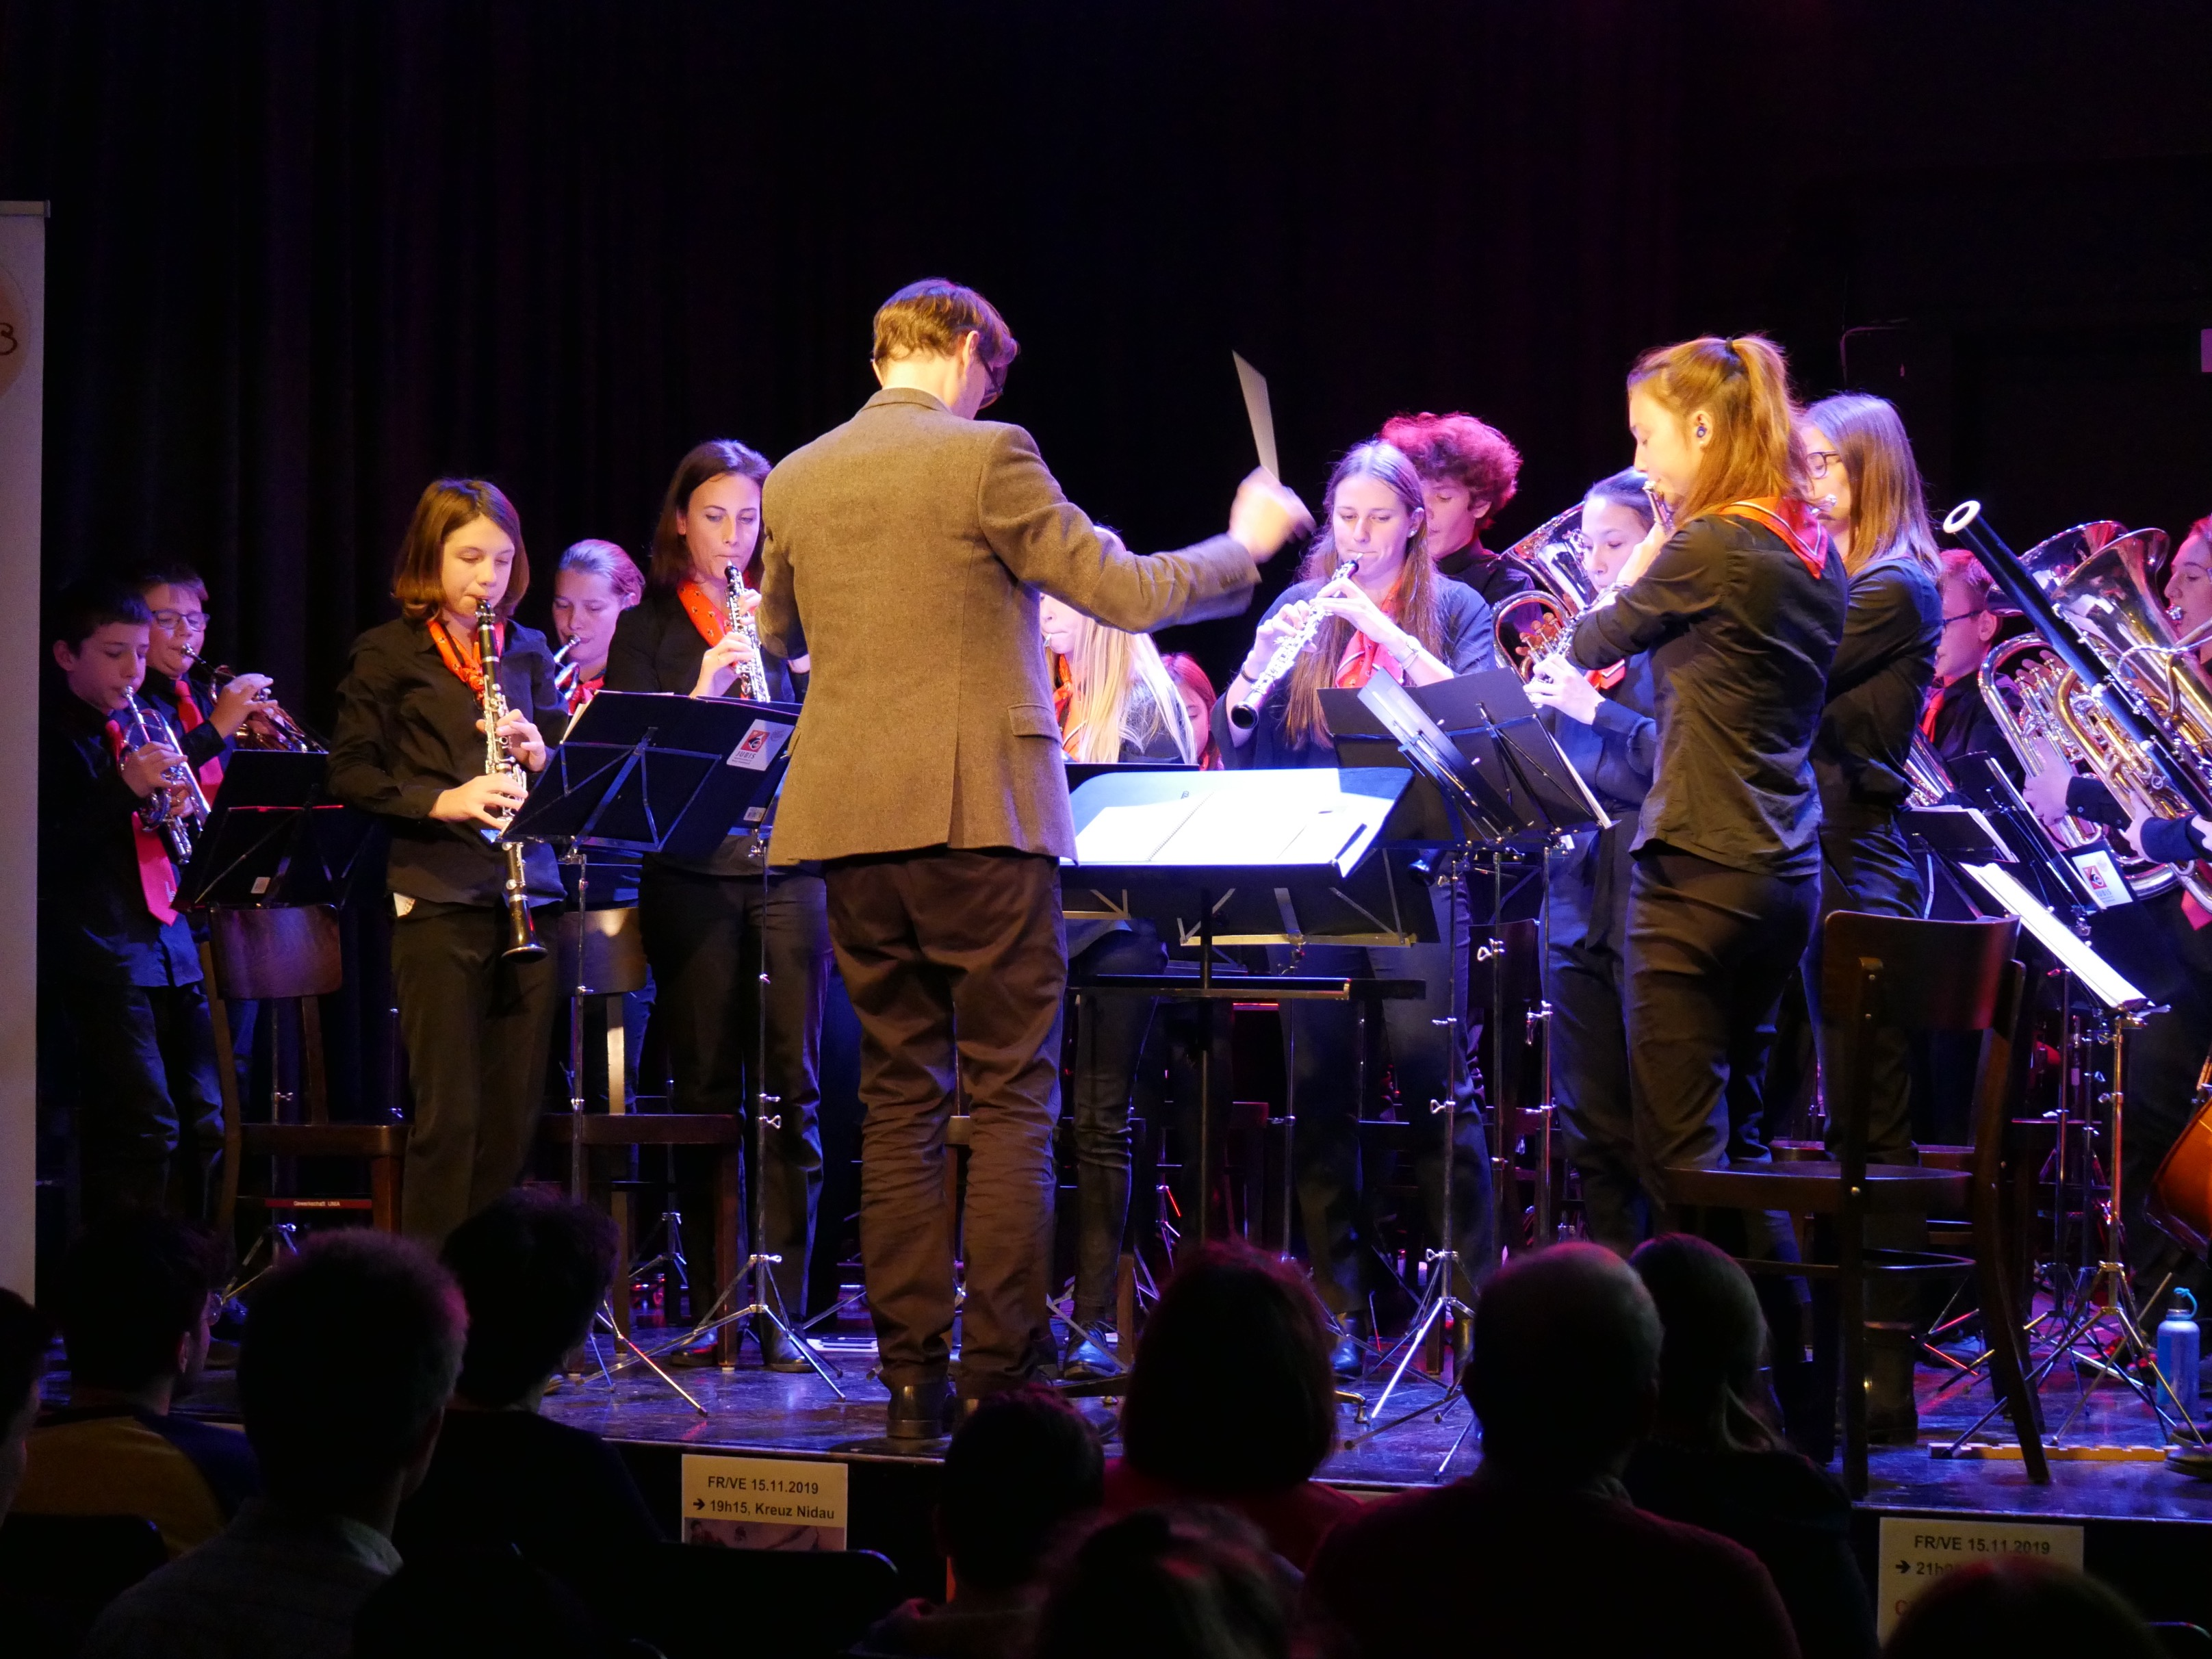 Klavier- und Kammermusikfestival Musikschule Biel, 15. November